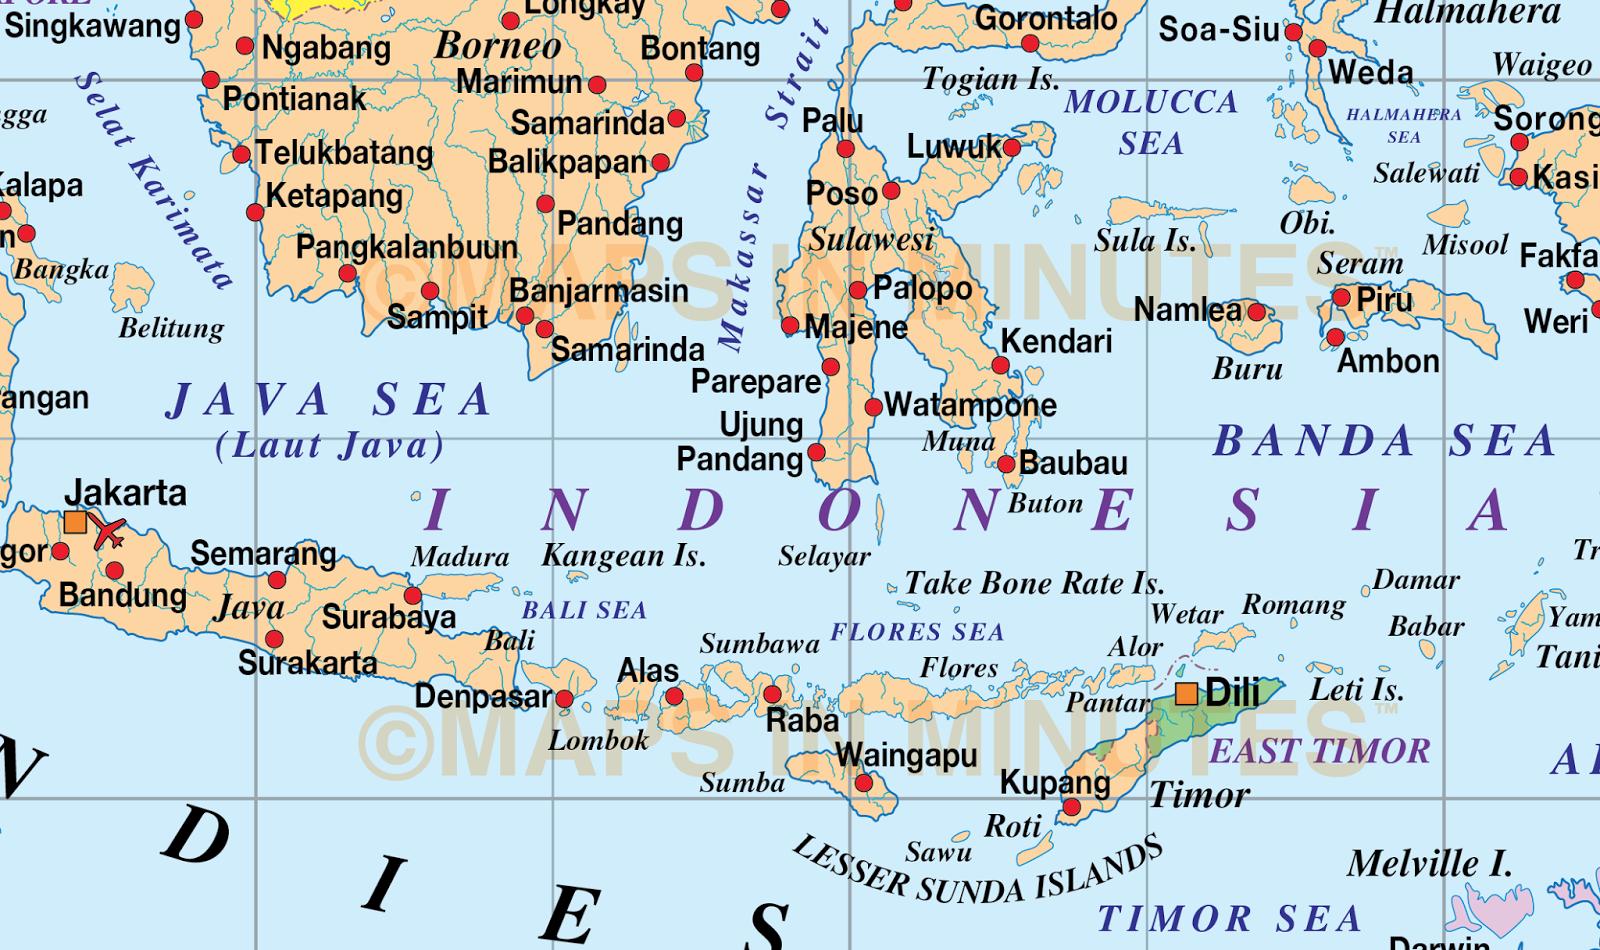 Gambar: Gambar Peta Indonesia Lengkap